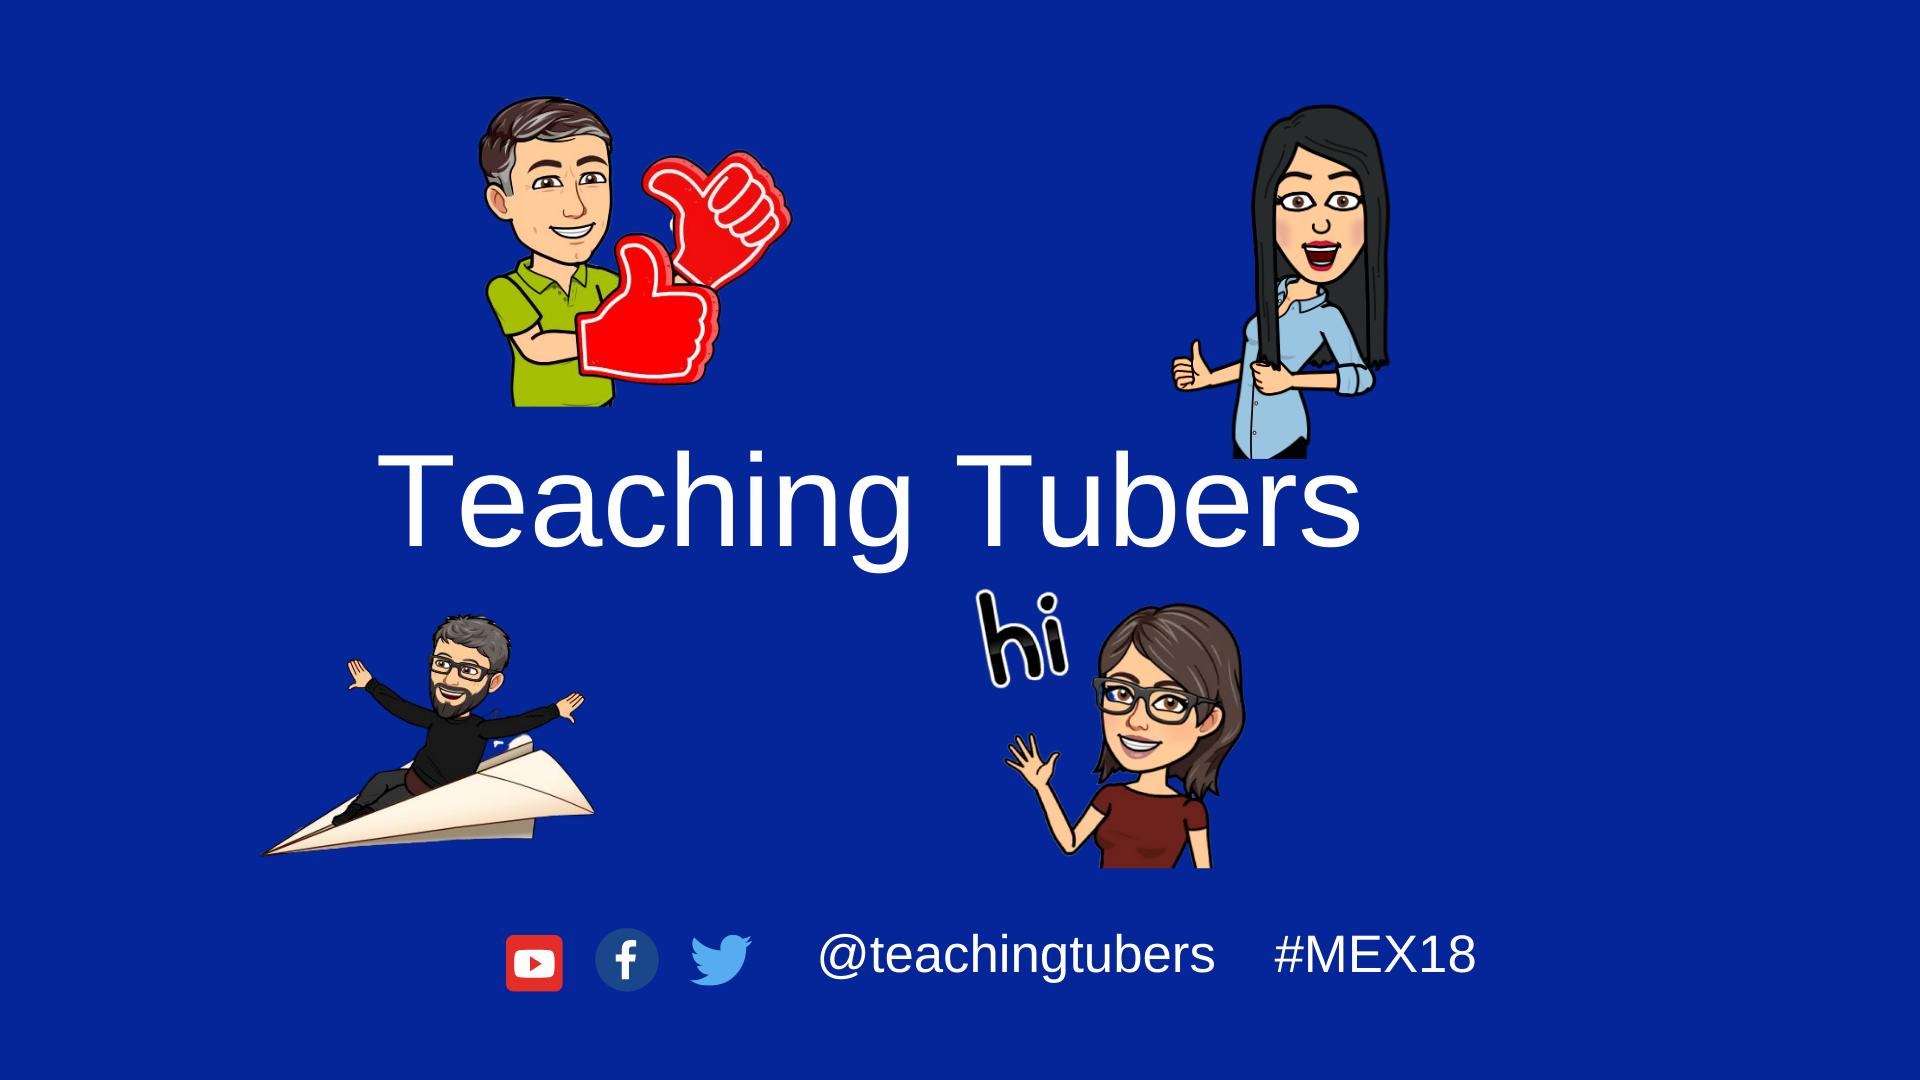 TeachingTubers